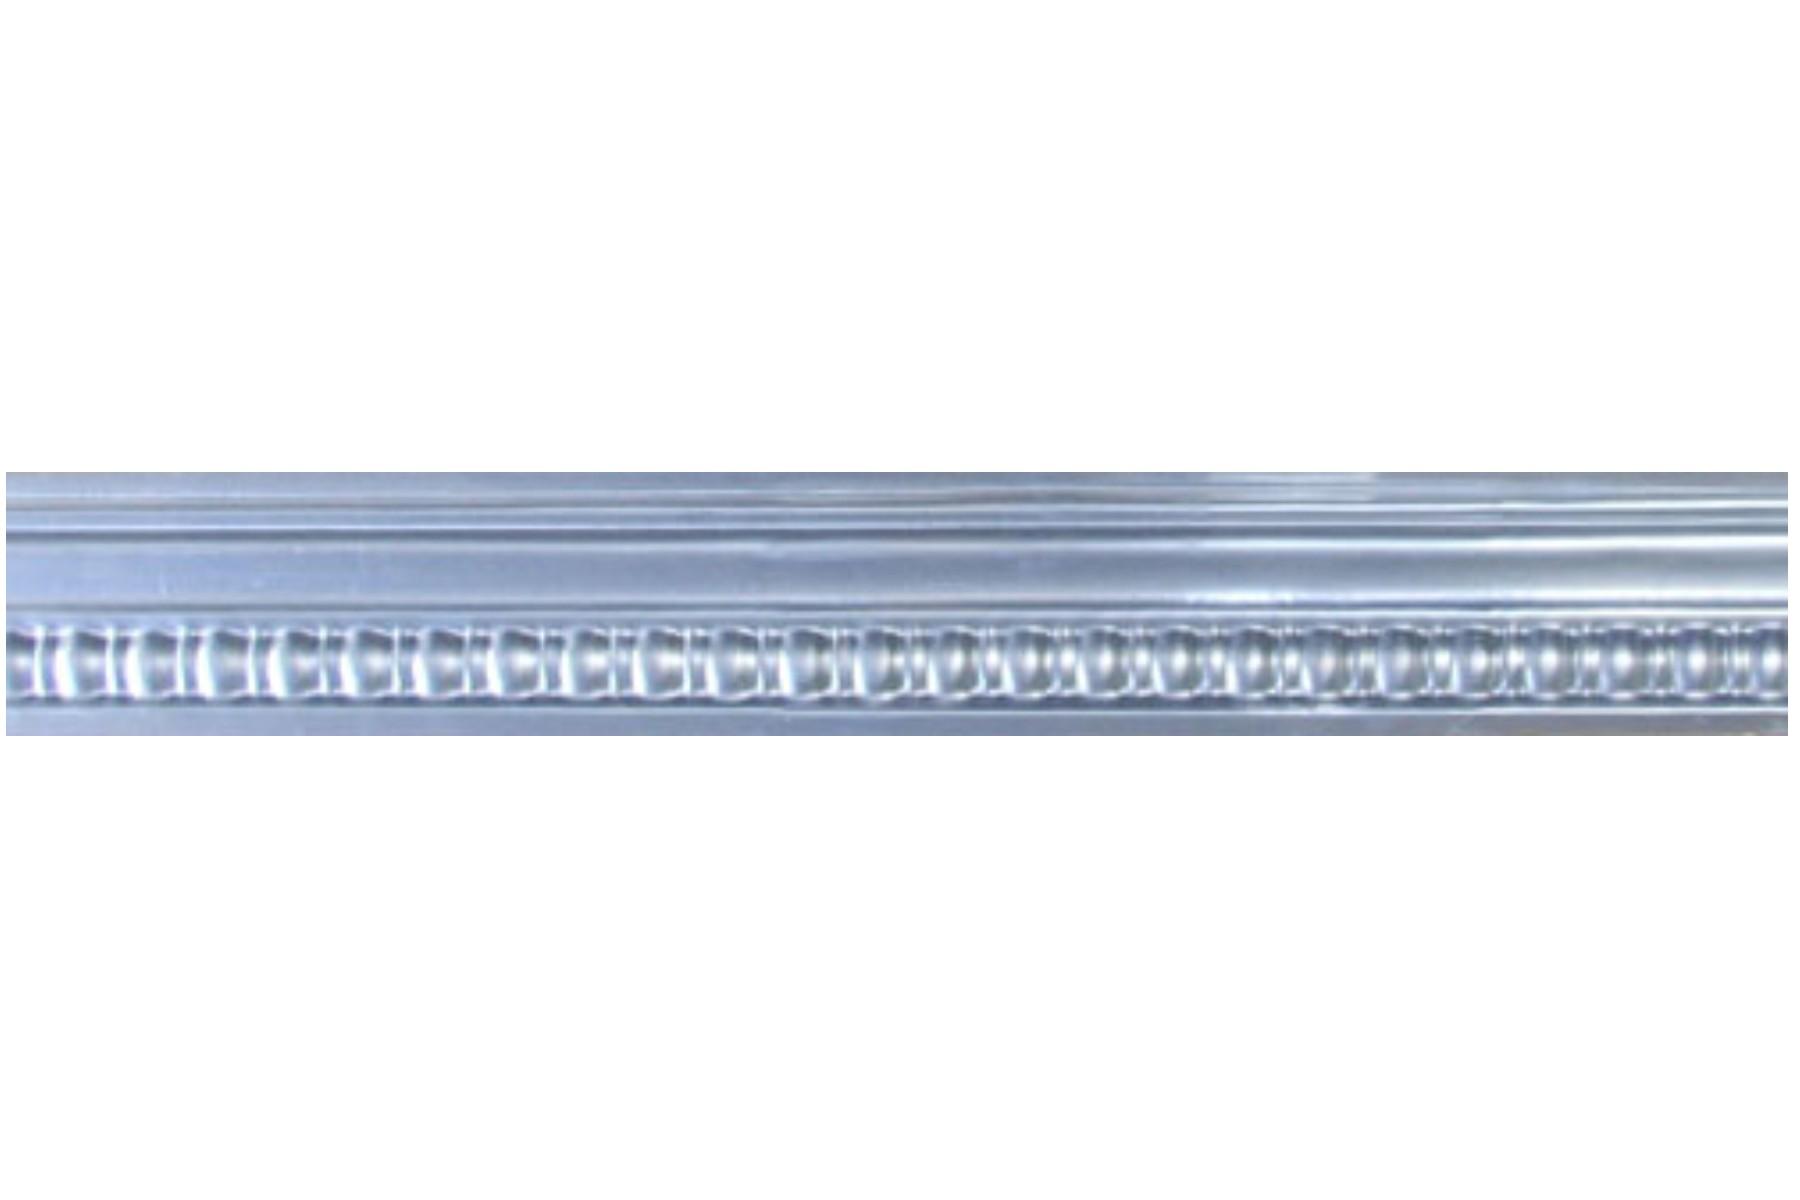 Wunderlich Pressed Metal Cornice No 2041 Beresford